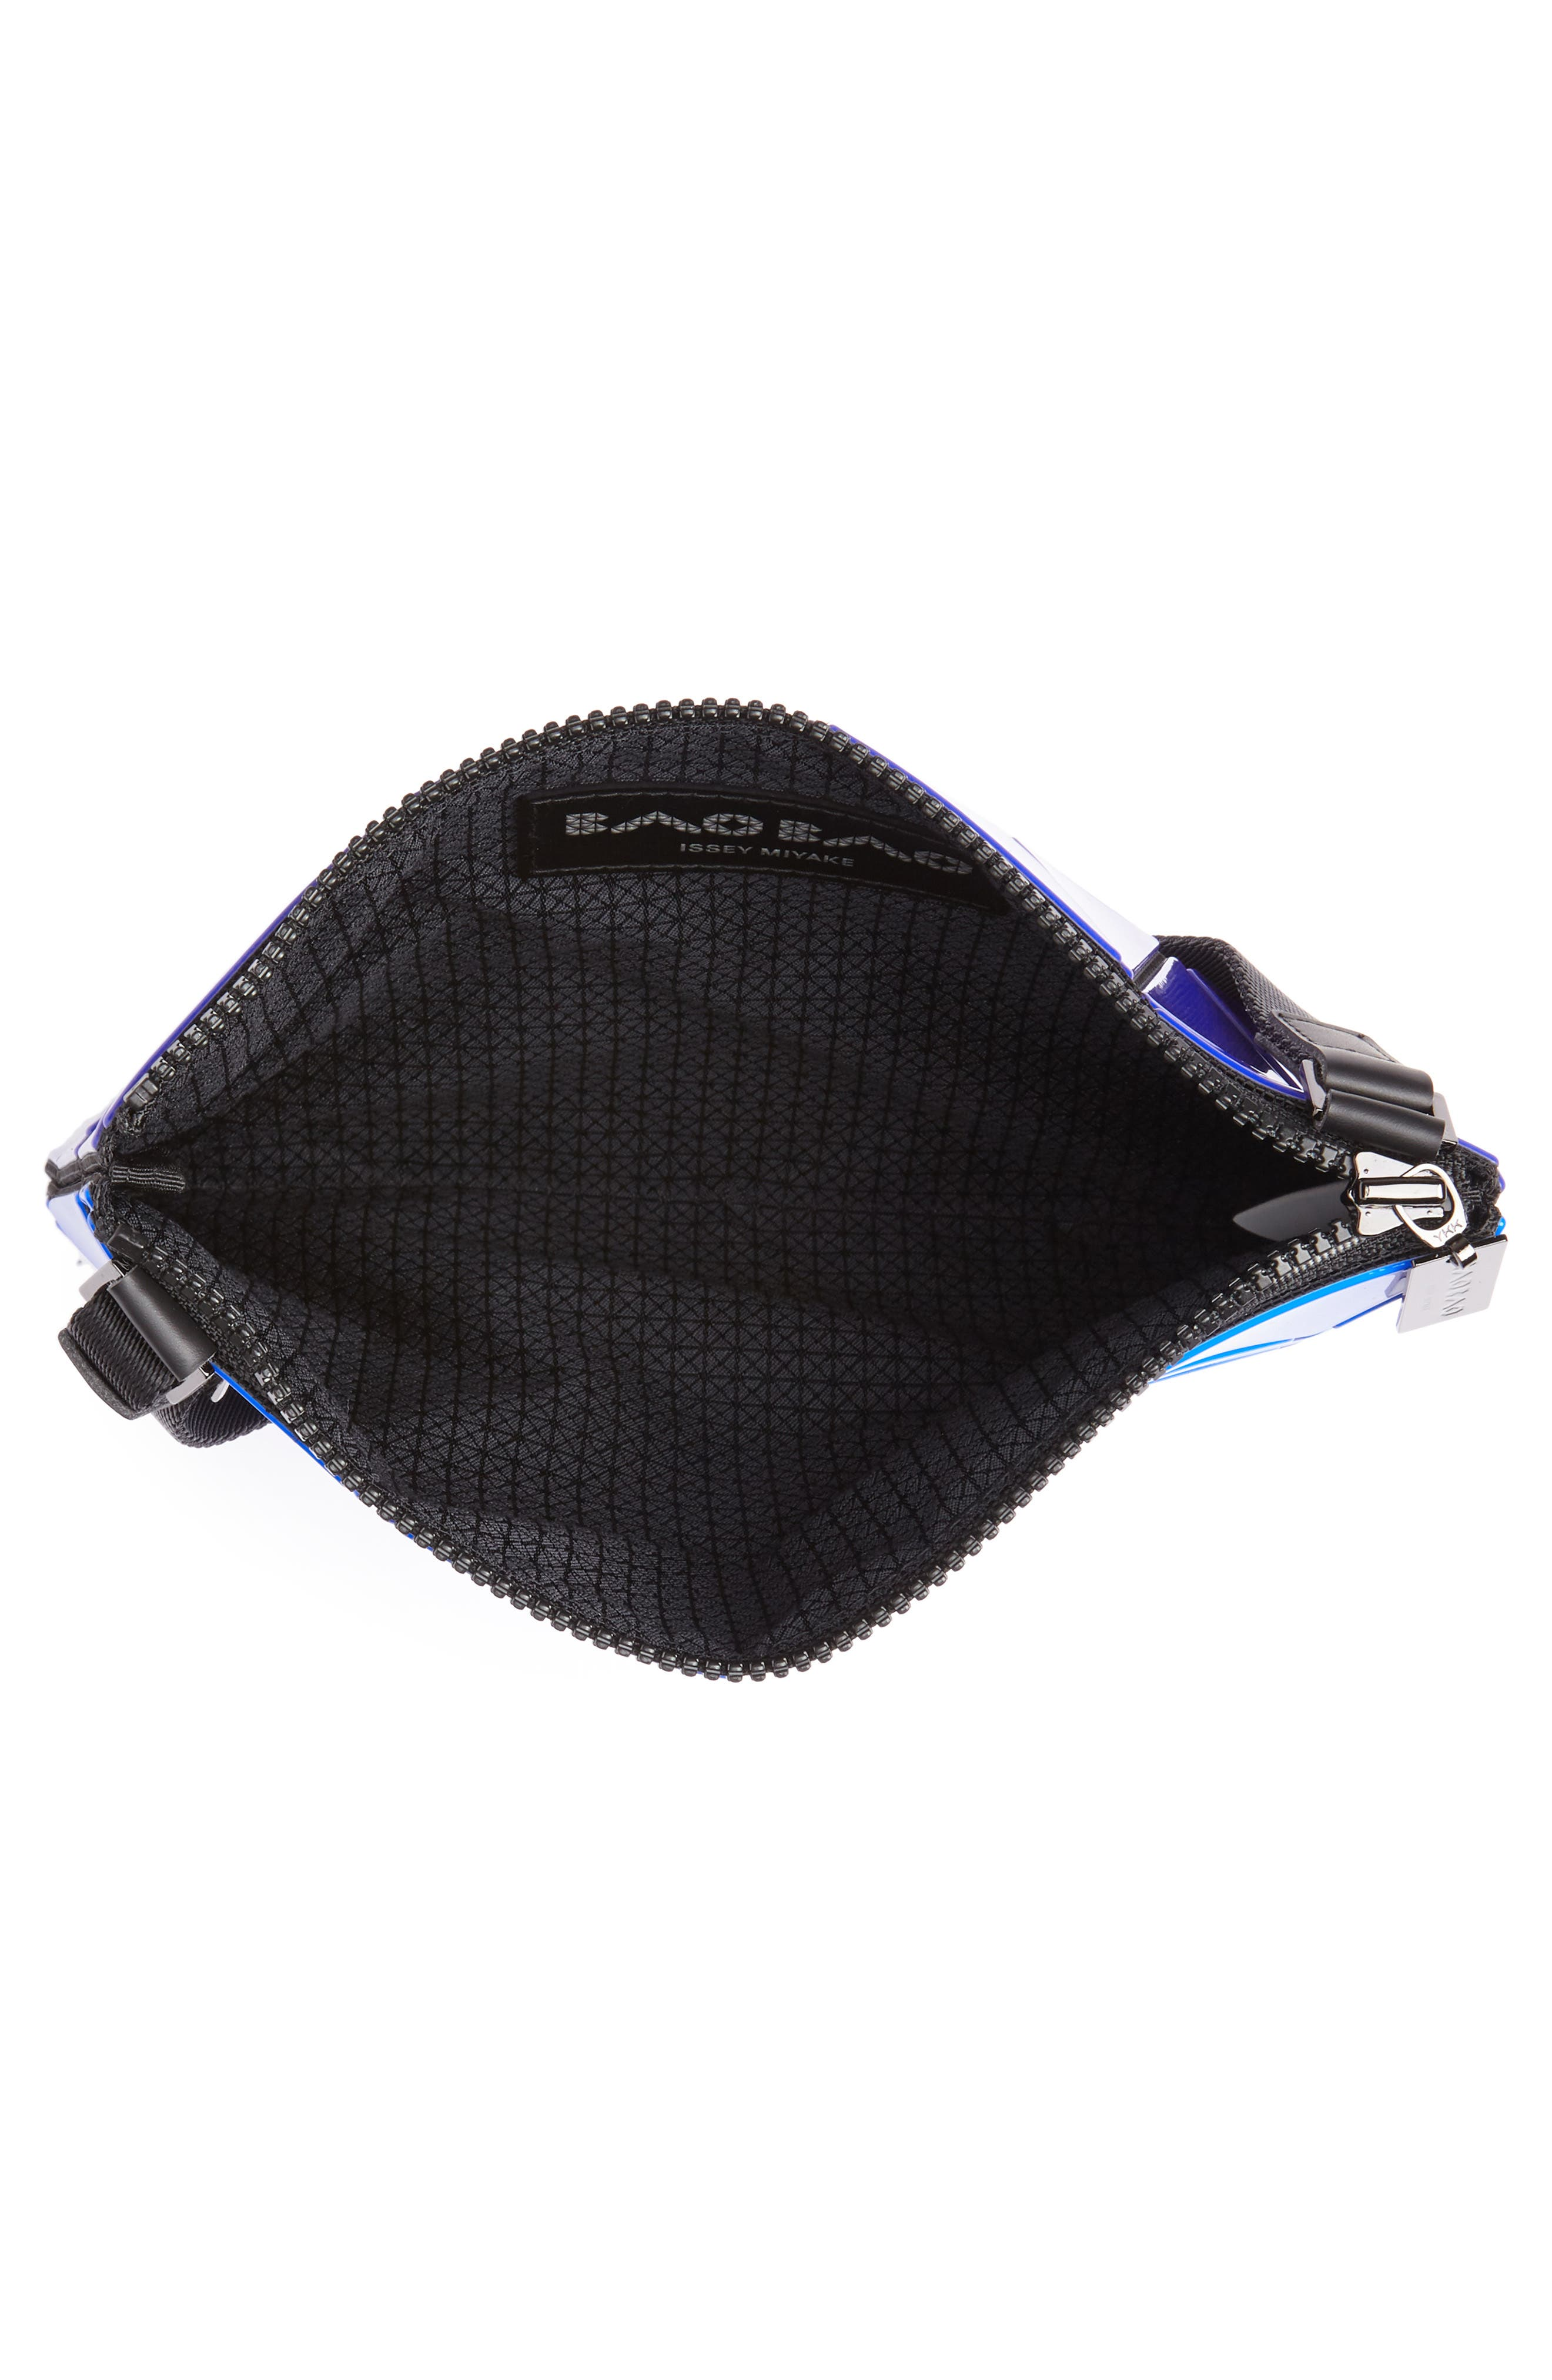 Lucent Two-Tone Crossbody Bag,                             Alternate thumbnail 6, color,                             Blue/ Dark Blue